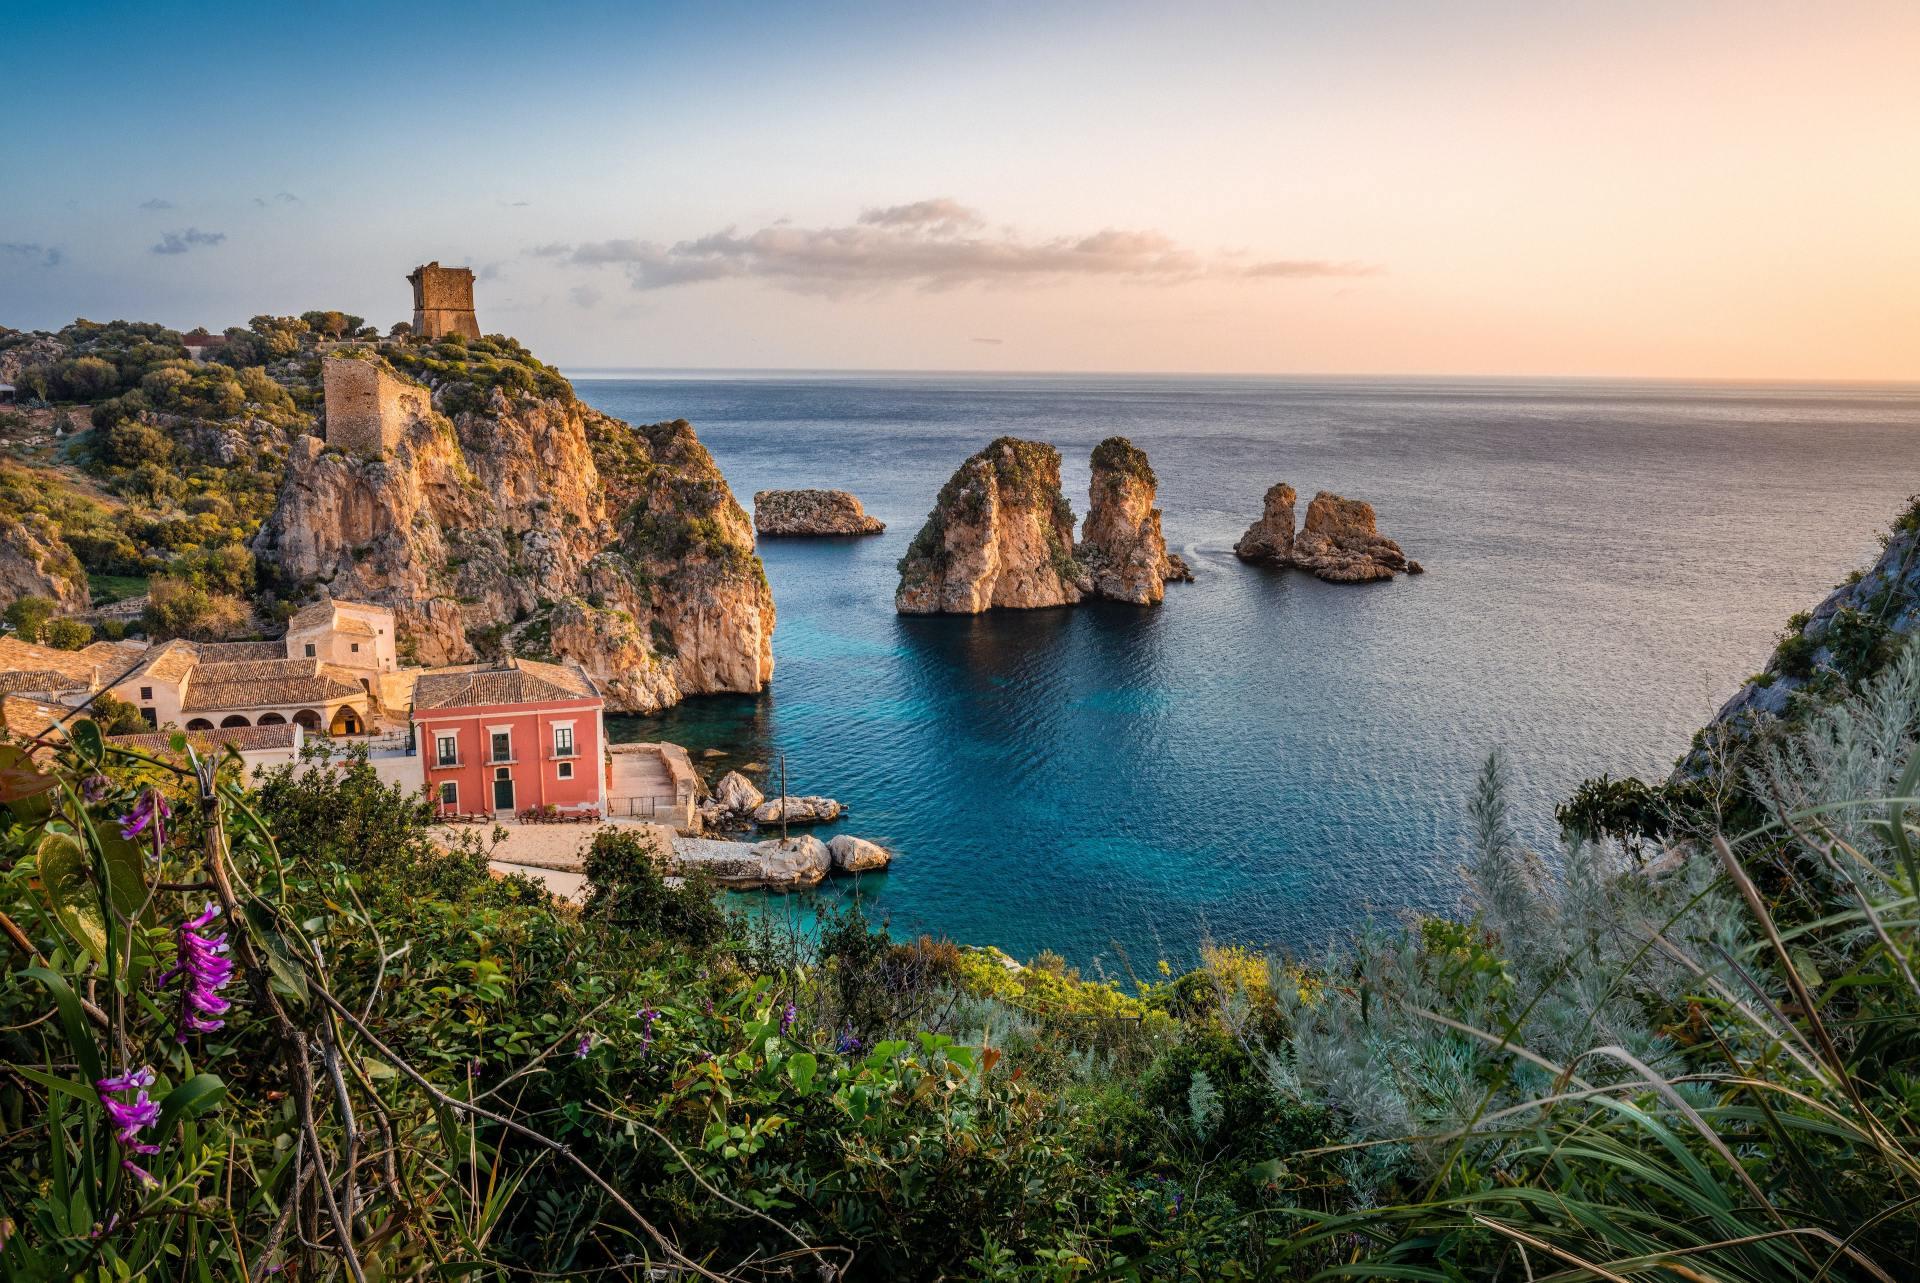 Scopello, Castellammare del Golfo, Italie Sicilie